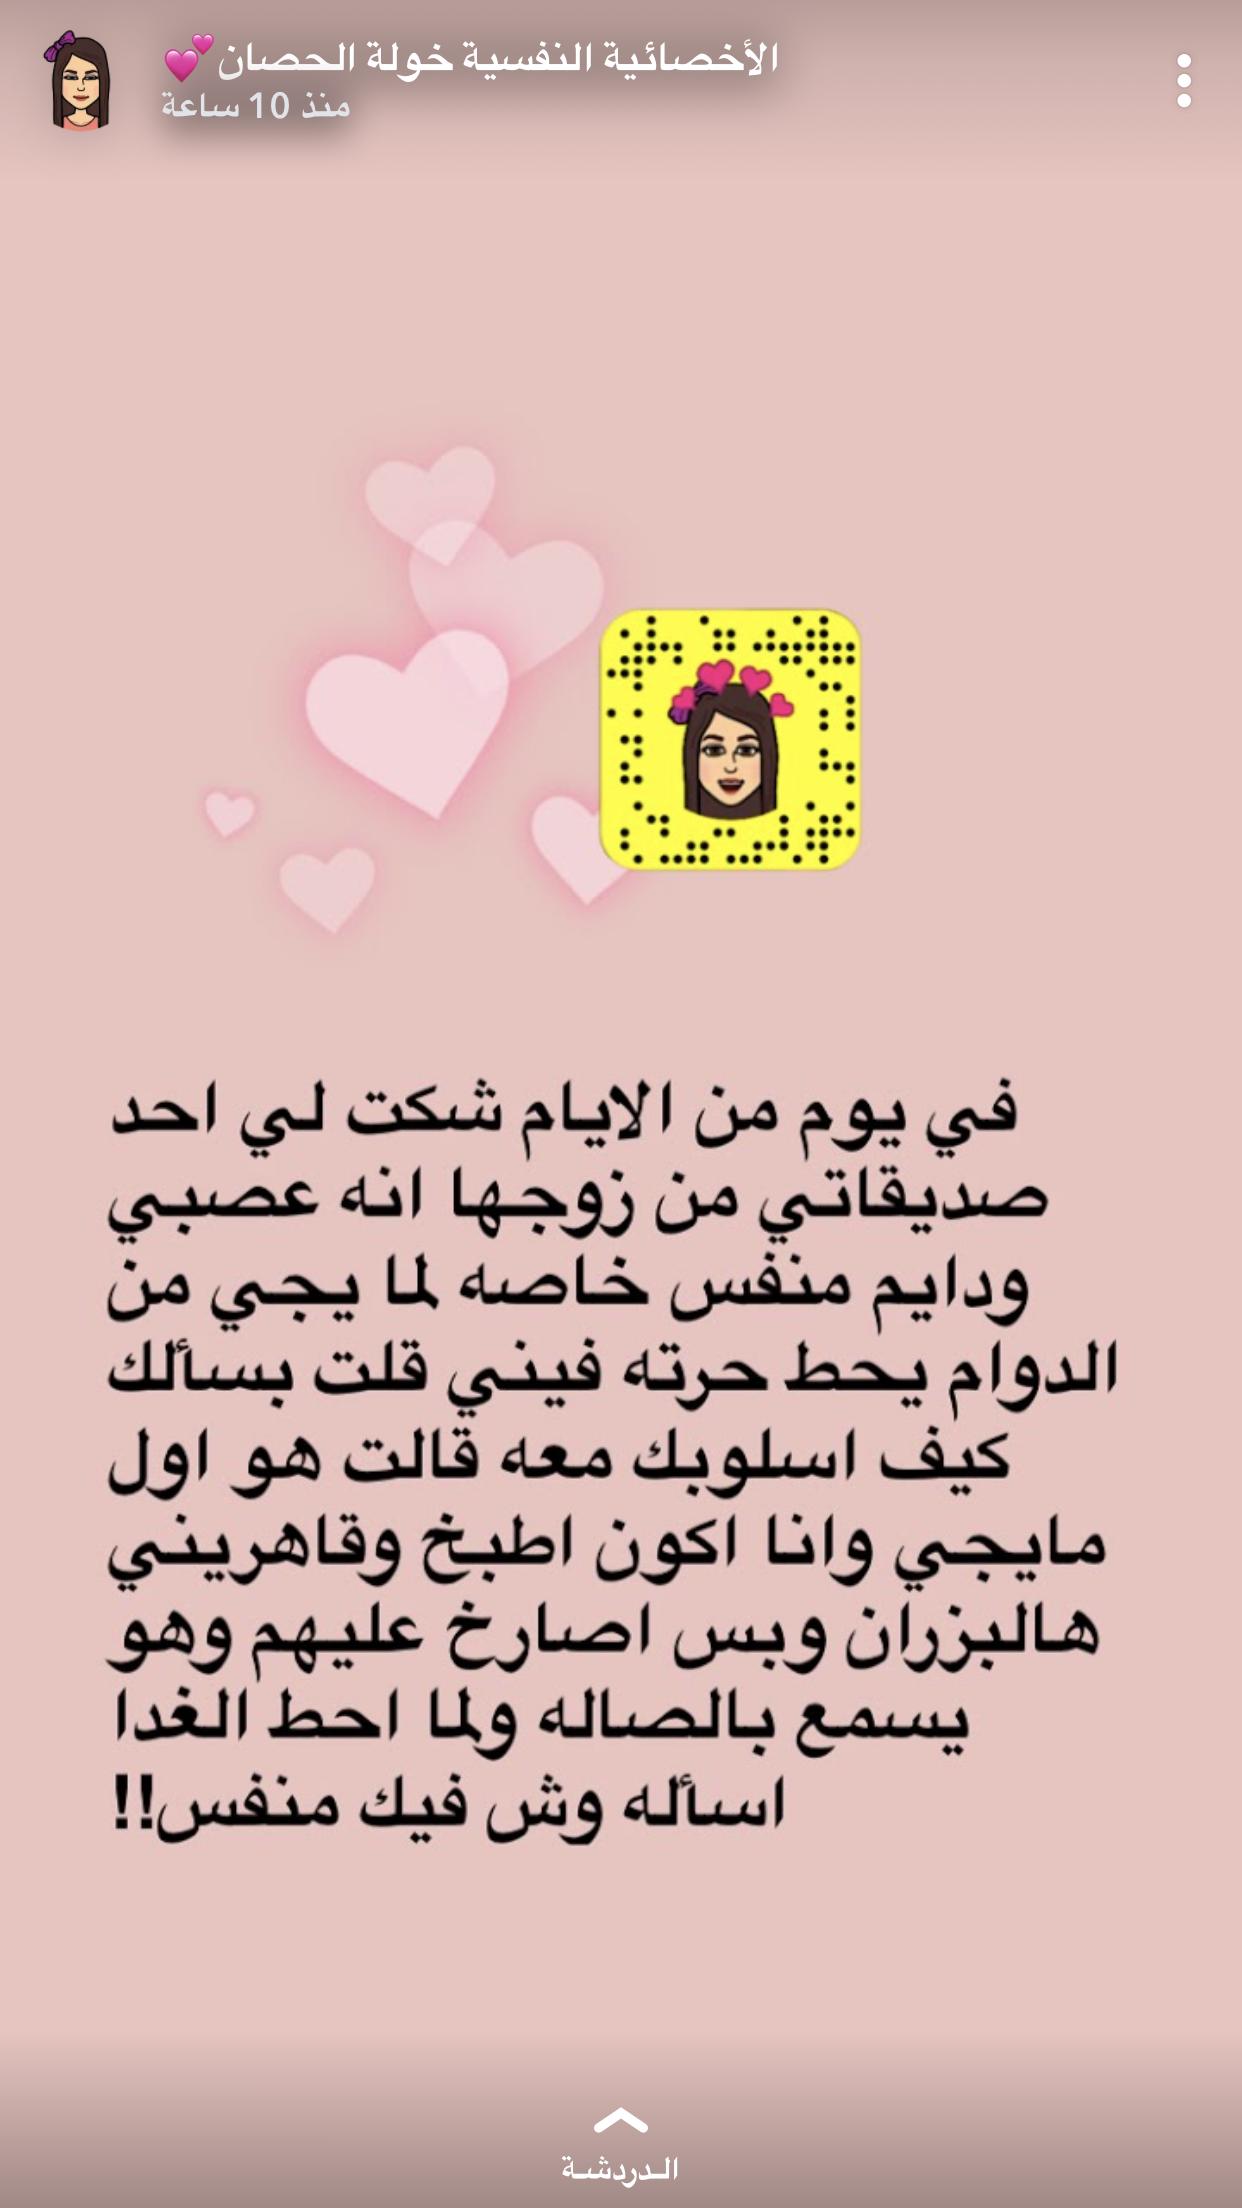 Pin By Istifada استفادة On سنابات الحياه Positive Quotes Life Rules Life Partners